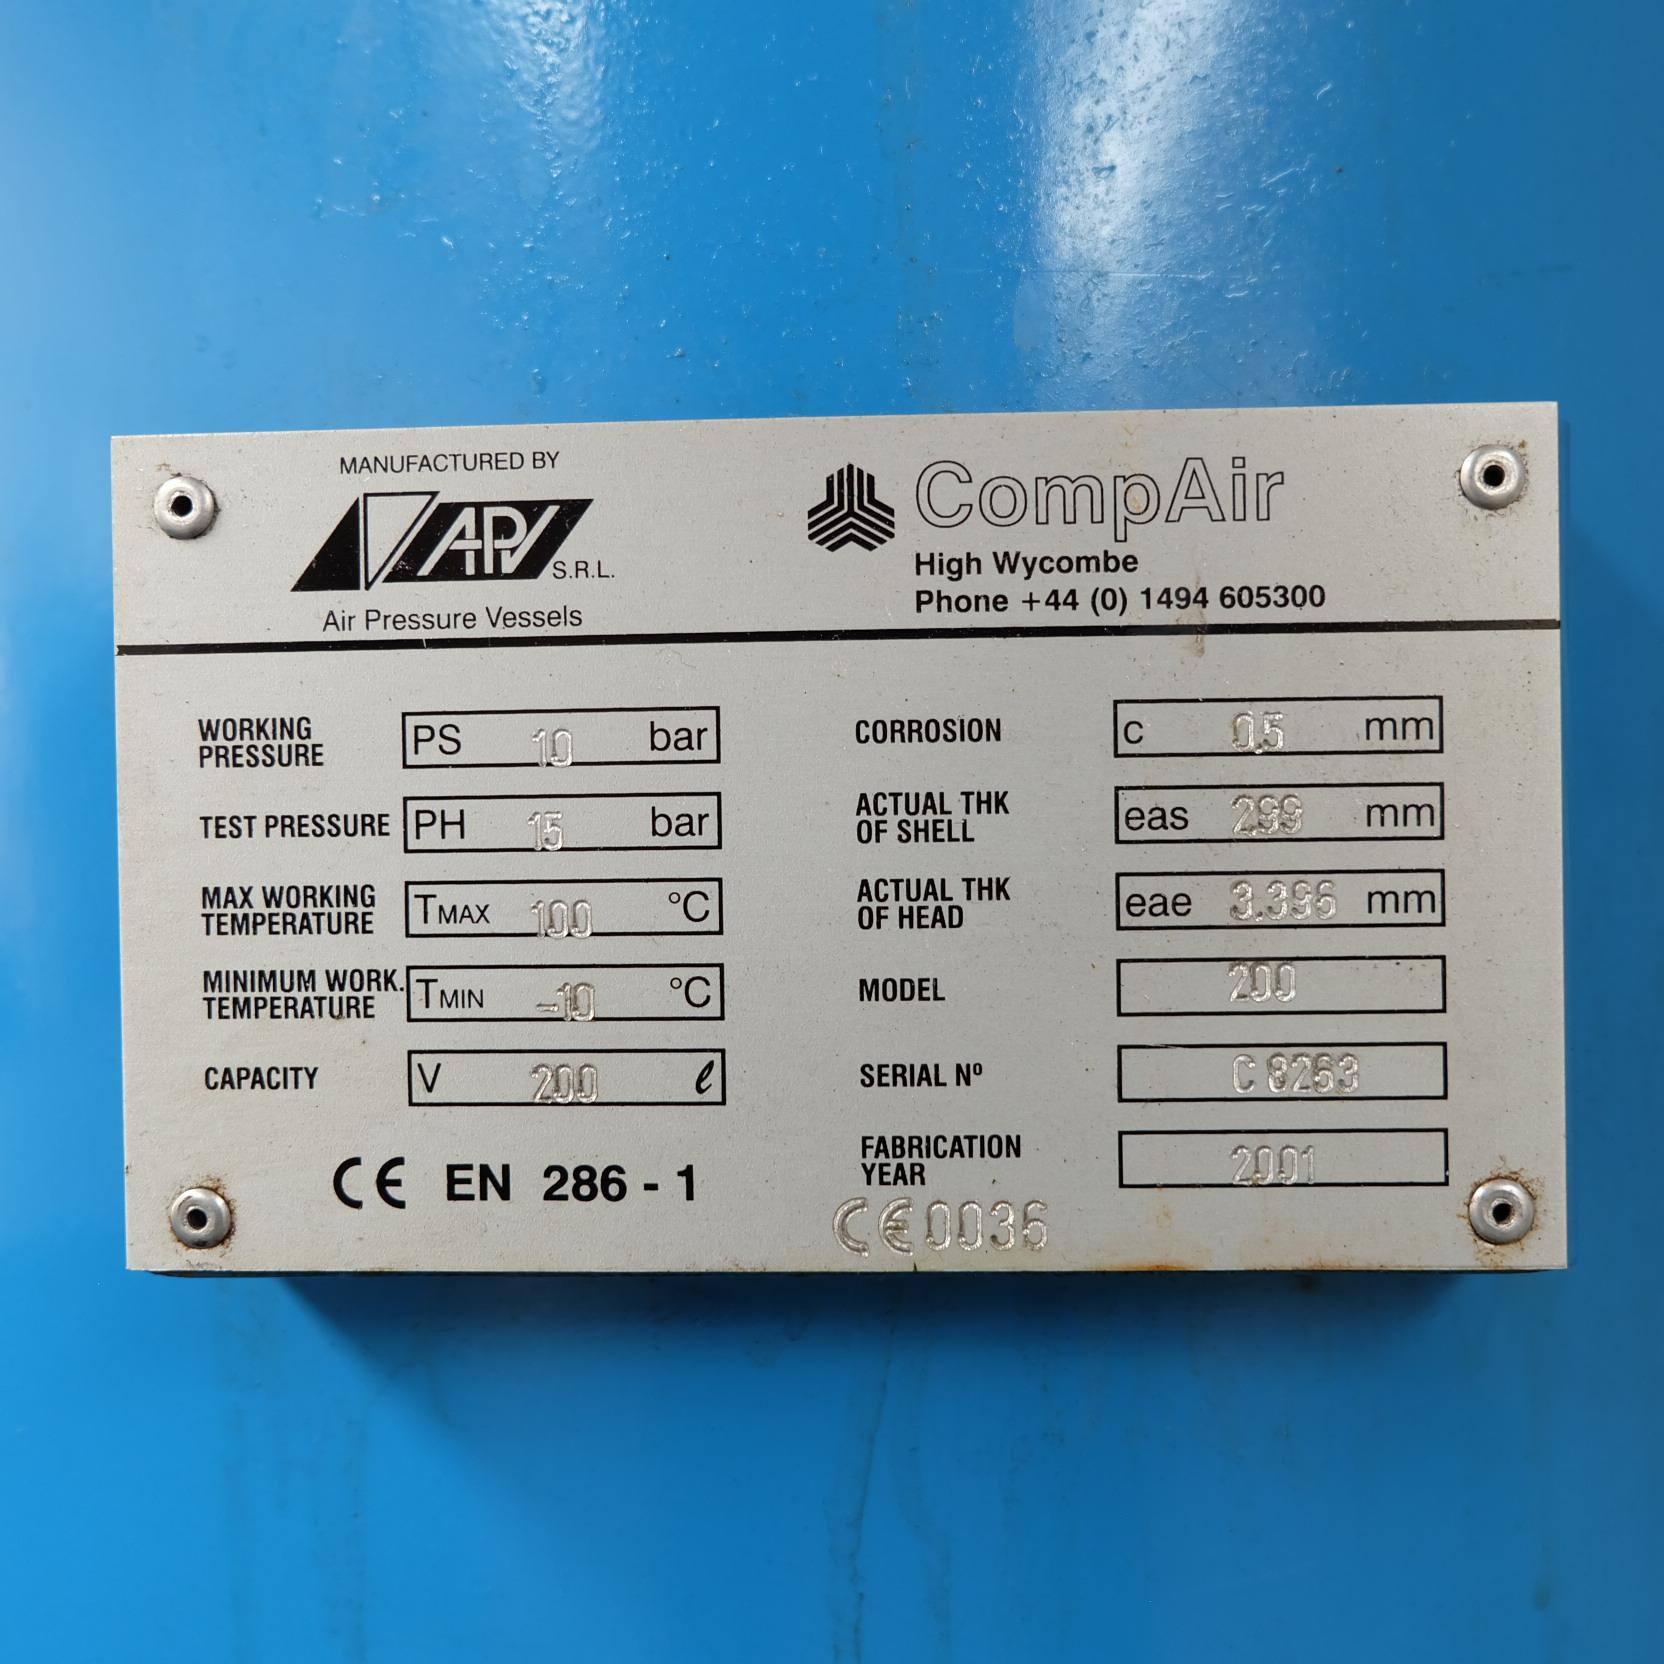 Lot 1 - A CompAir V07 Model 707PSAS07-4035S000 Rotary Air Compressor No.707-005803-0107, 1460rpm, 7.5kW with